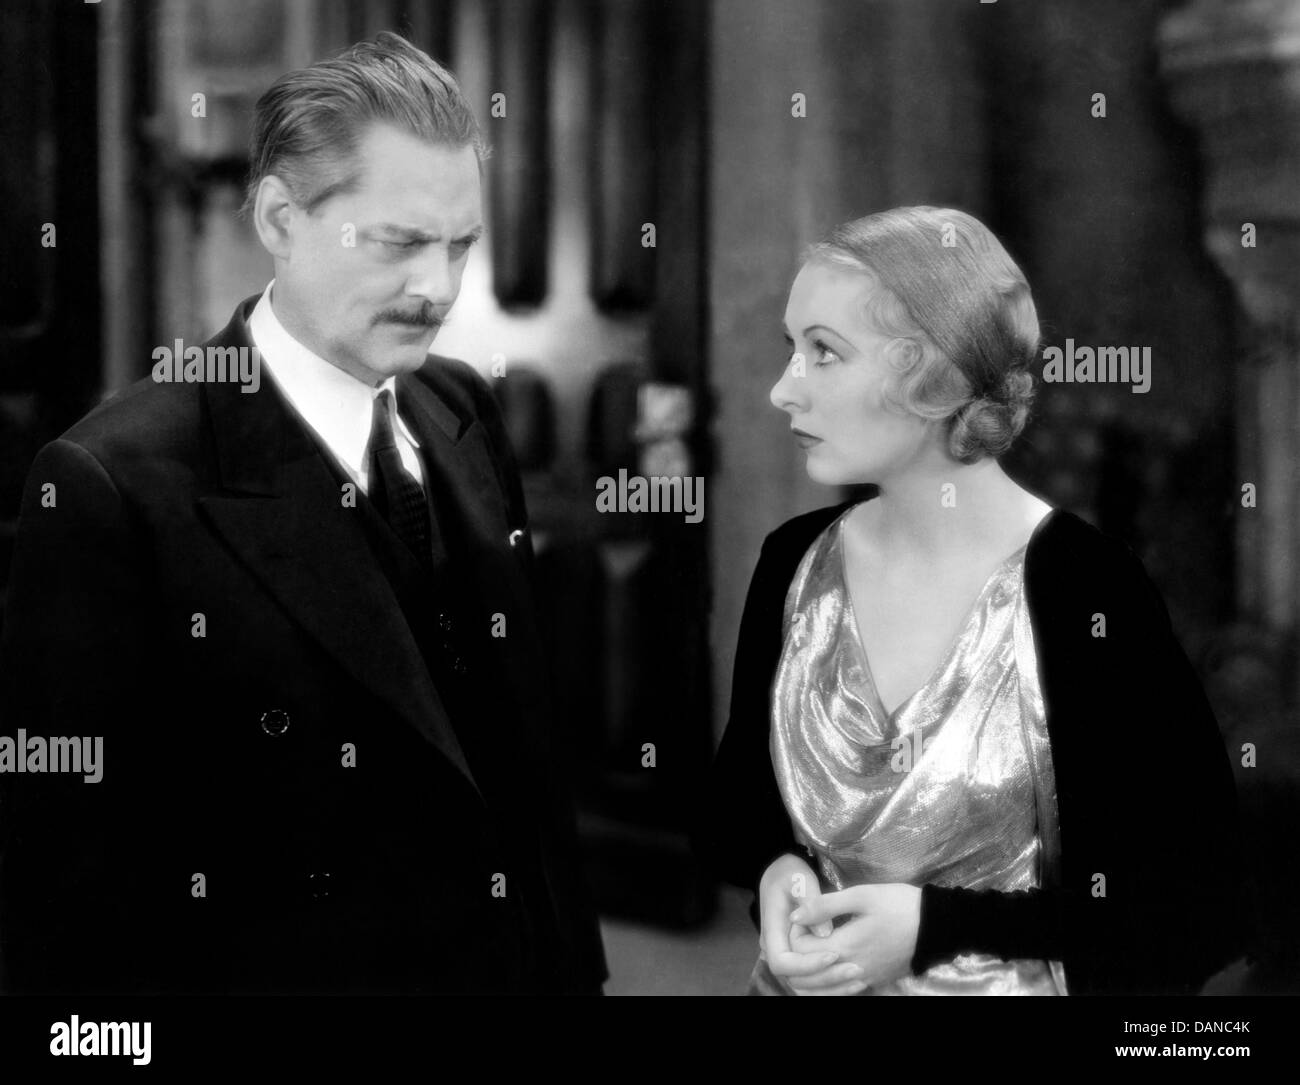 ARSENE LUPIN (1932) LIONEL BARRYMORE; JOHN KAREN MORLEY; JACK CONWAY (DIR); ALPN 002 MOVIESTORE COLLECTION LTD Stock Photo